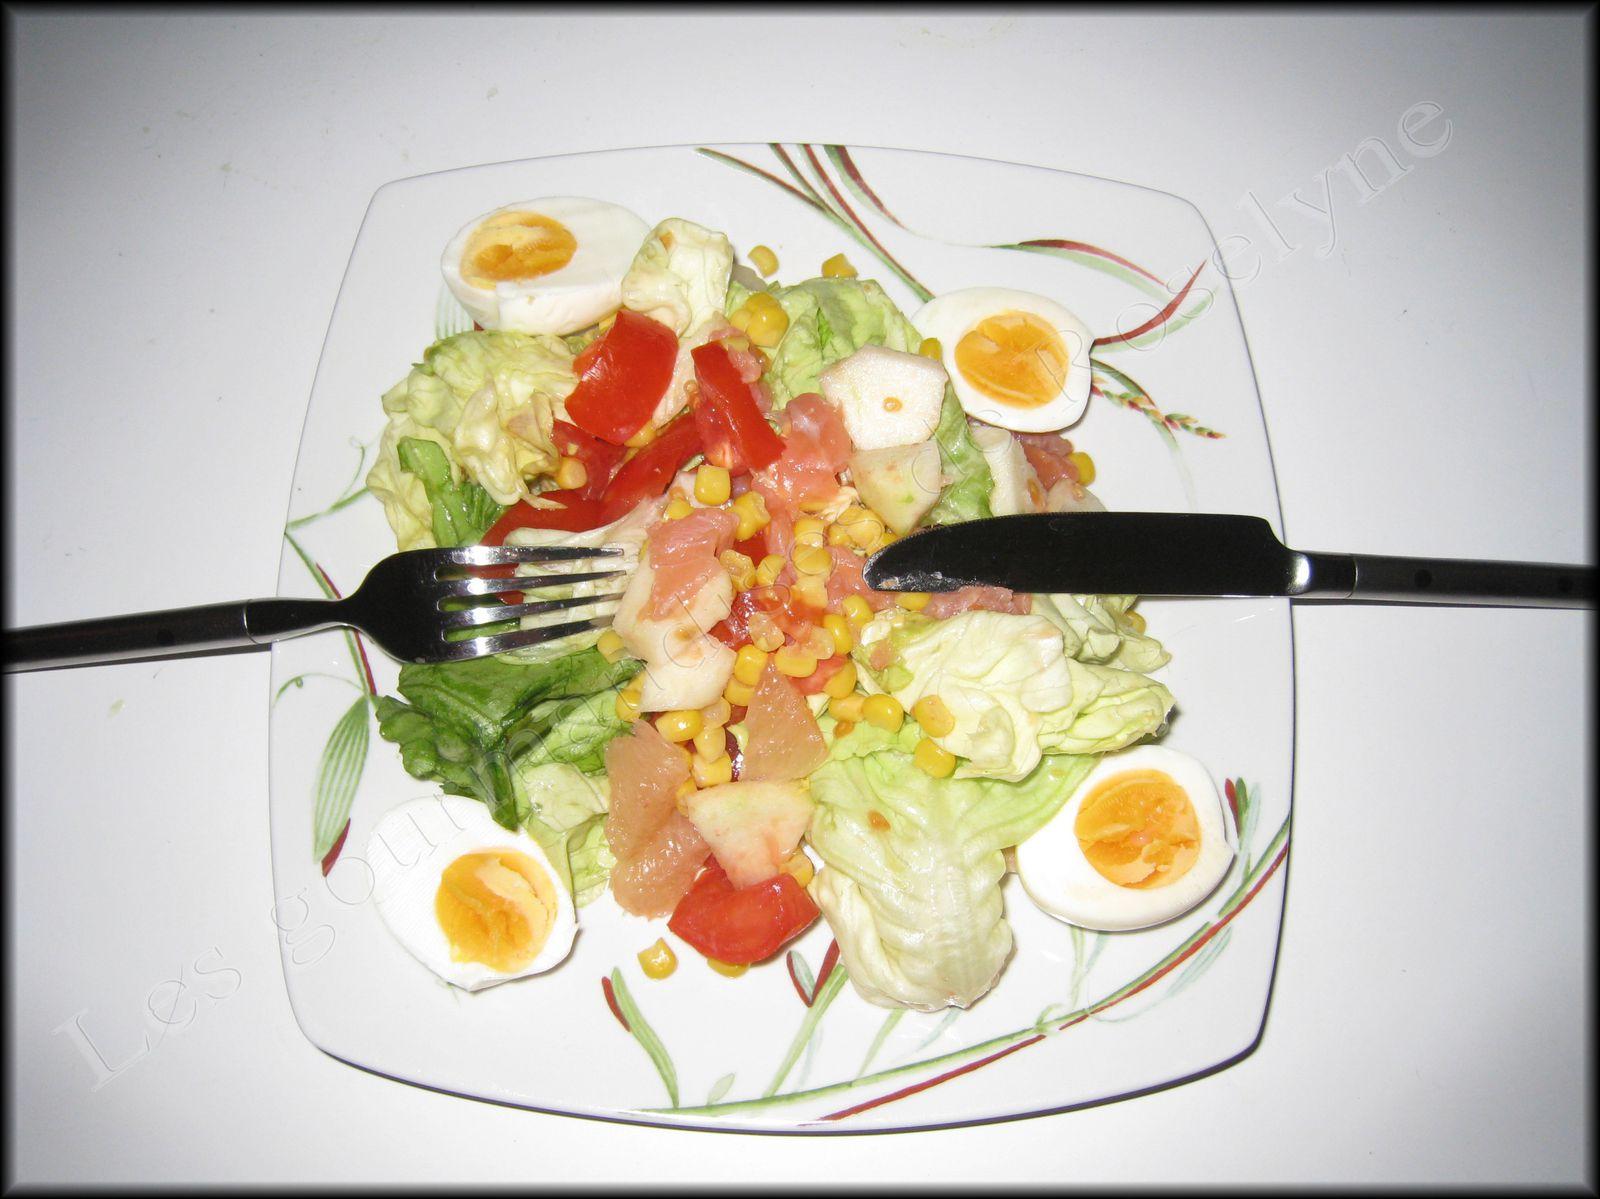 Salade maïs, tomates, oeufs, pamplemousse, pomme